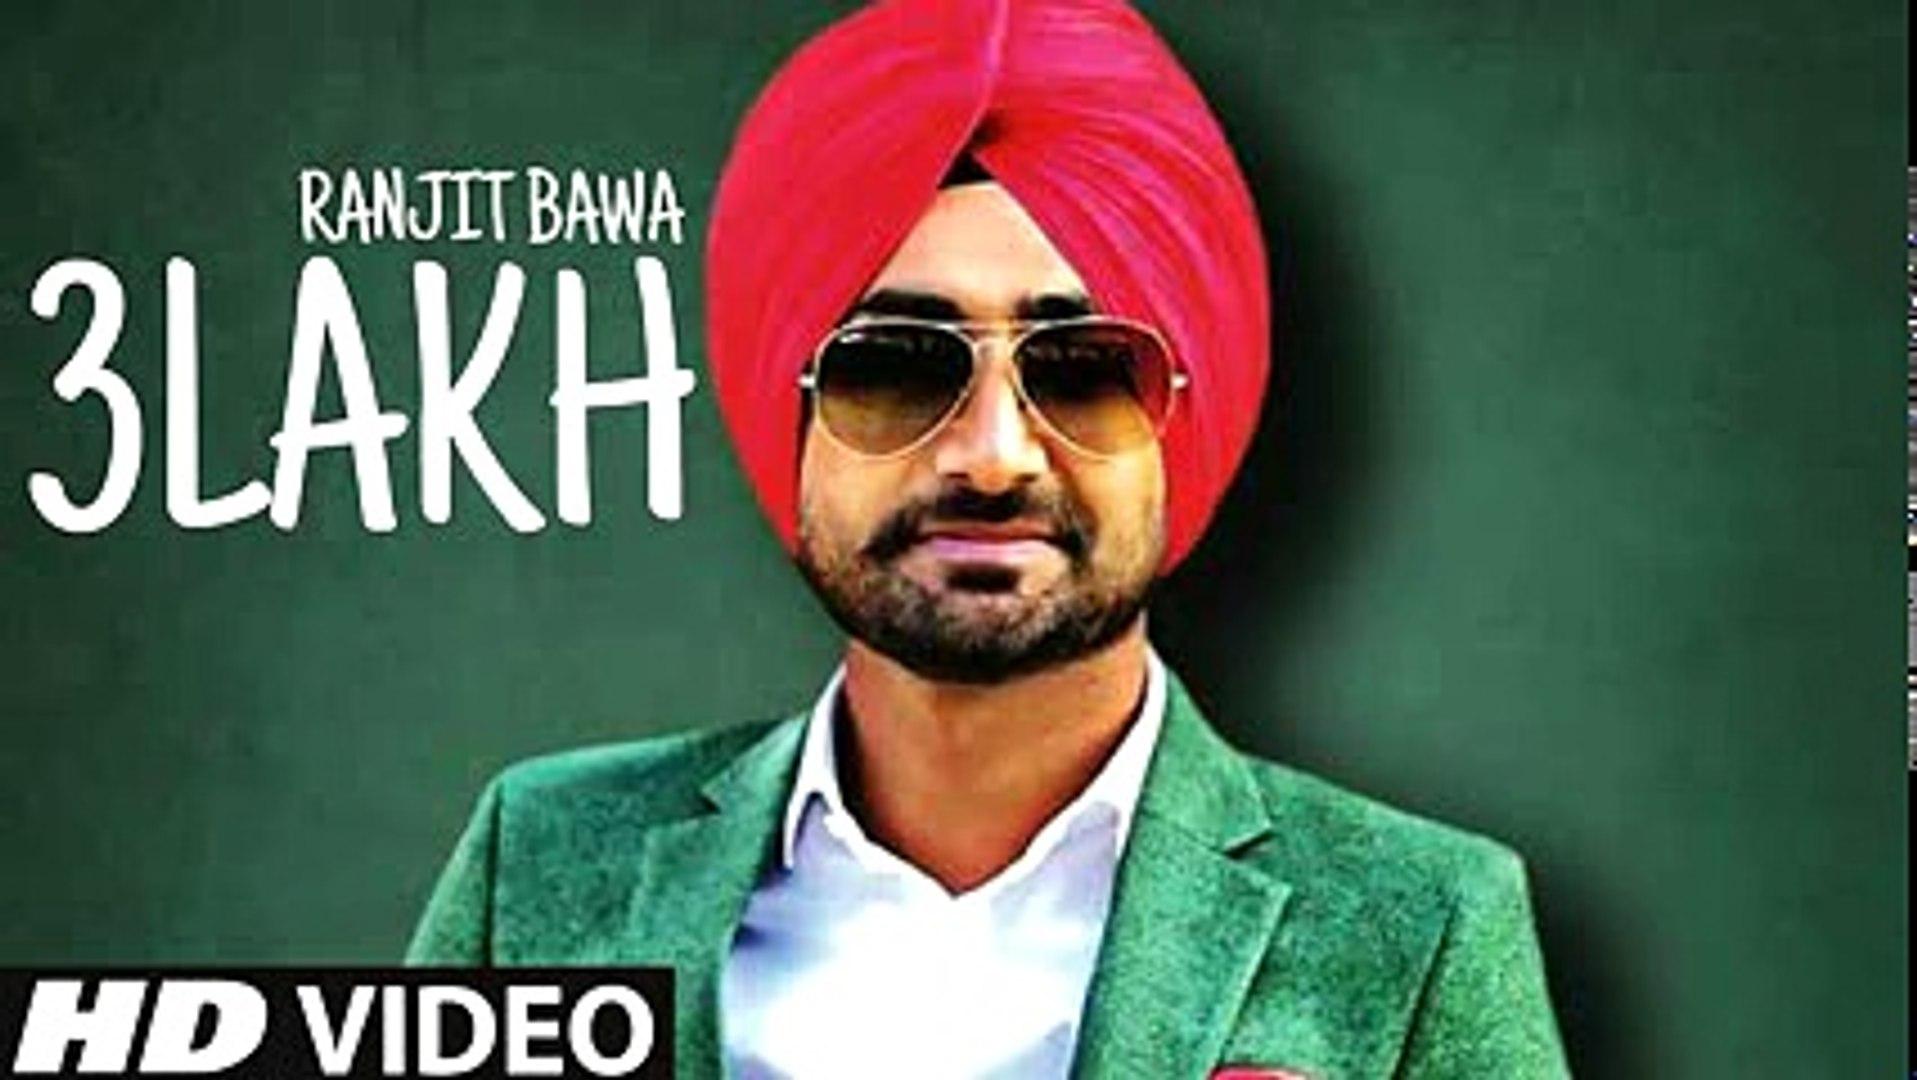 3lakh Full Song Ranjit Bawa Latest Punjabi Songs Hd 2016 Video Dailymotion